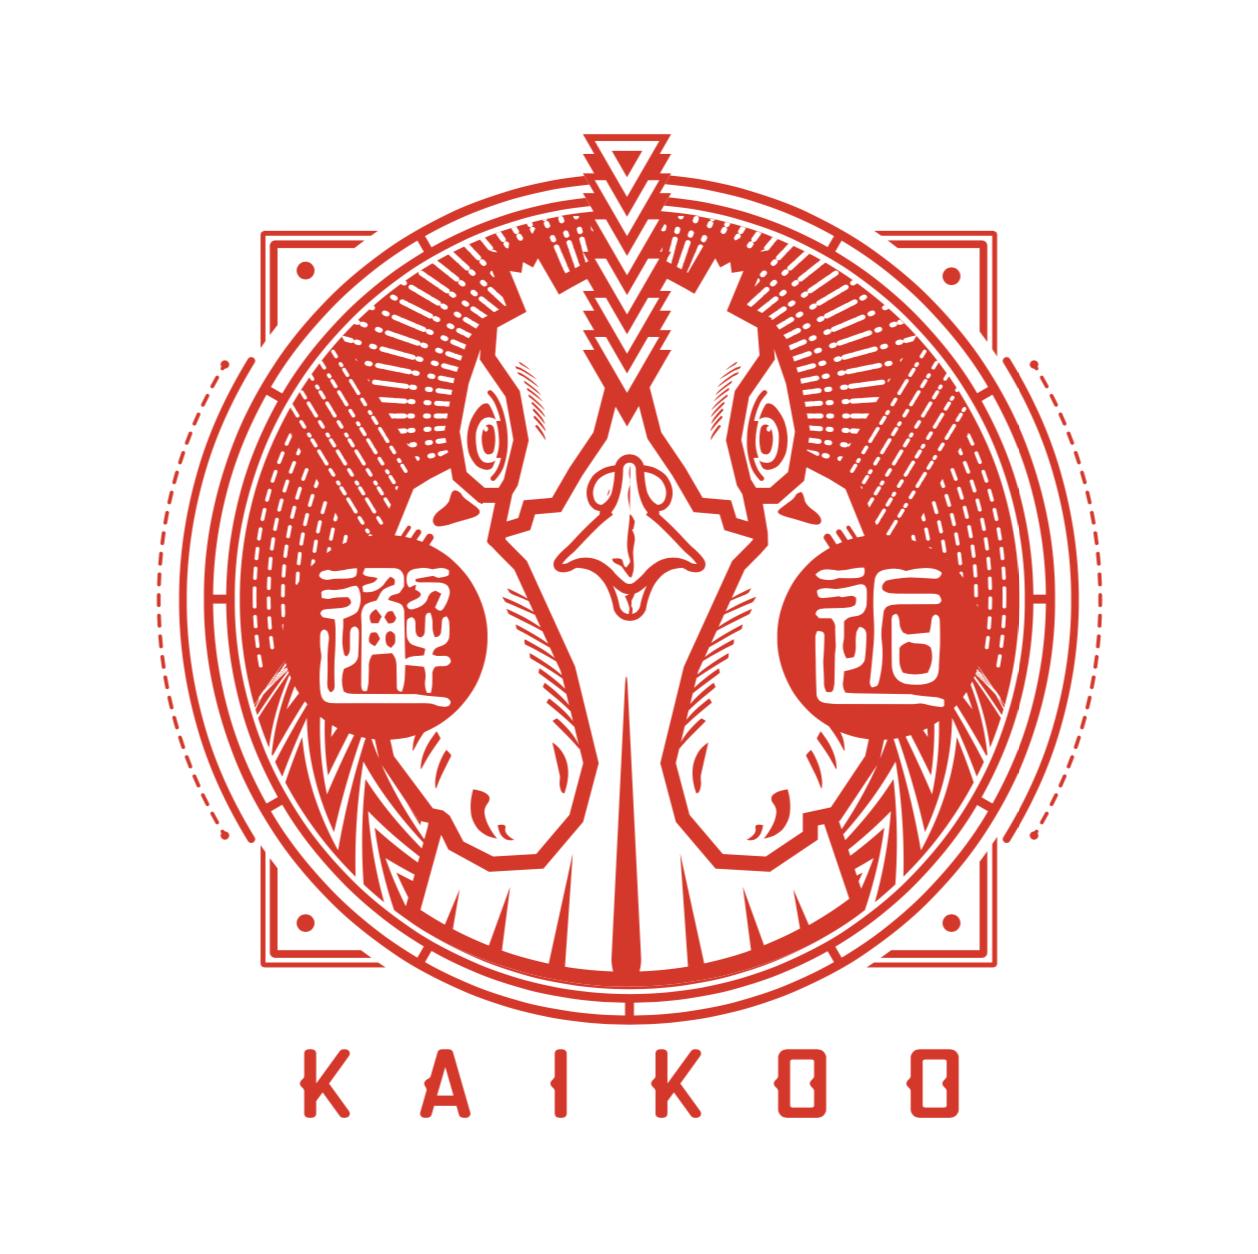 KAIKOO